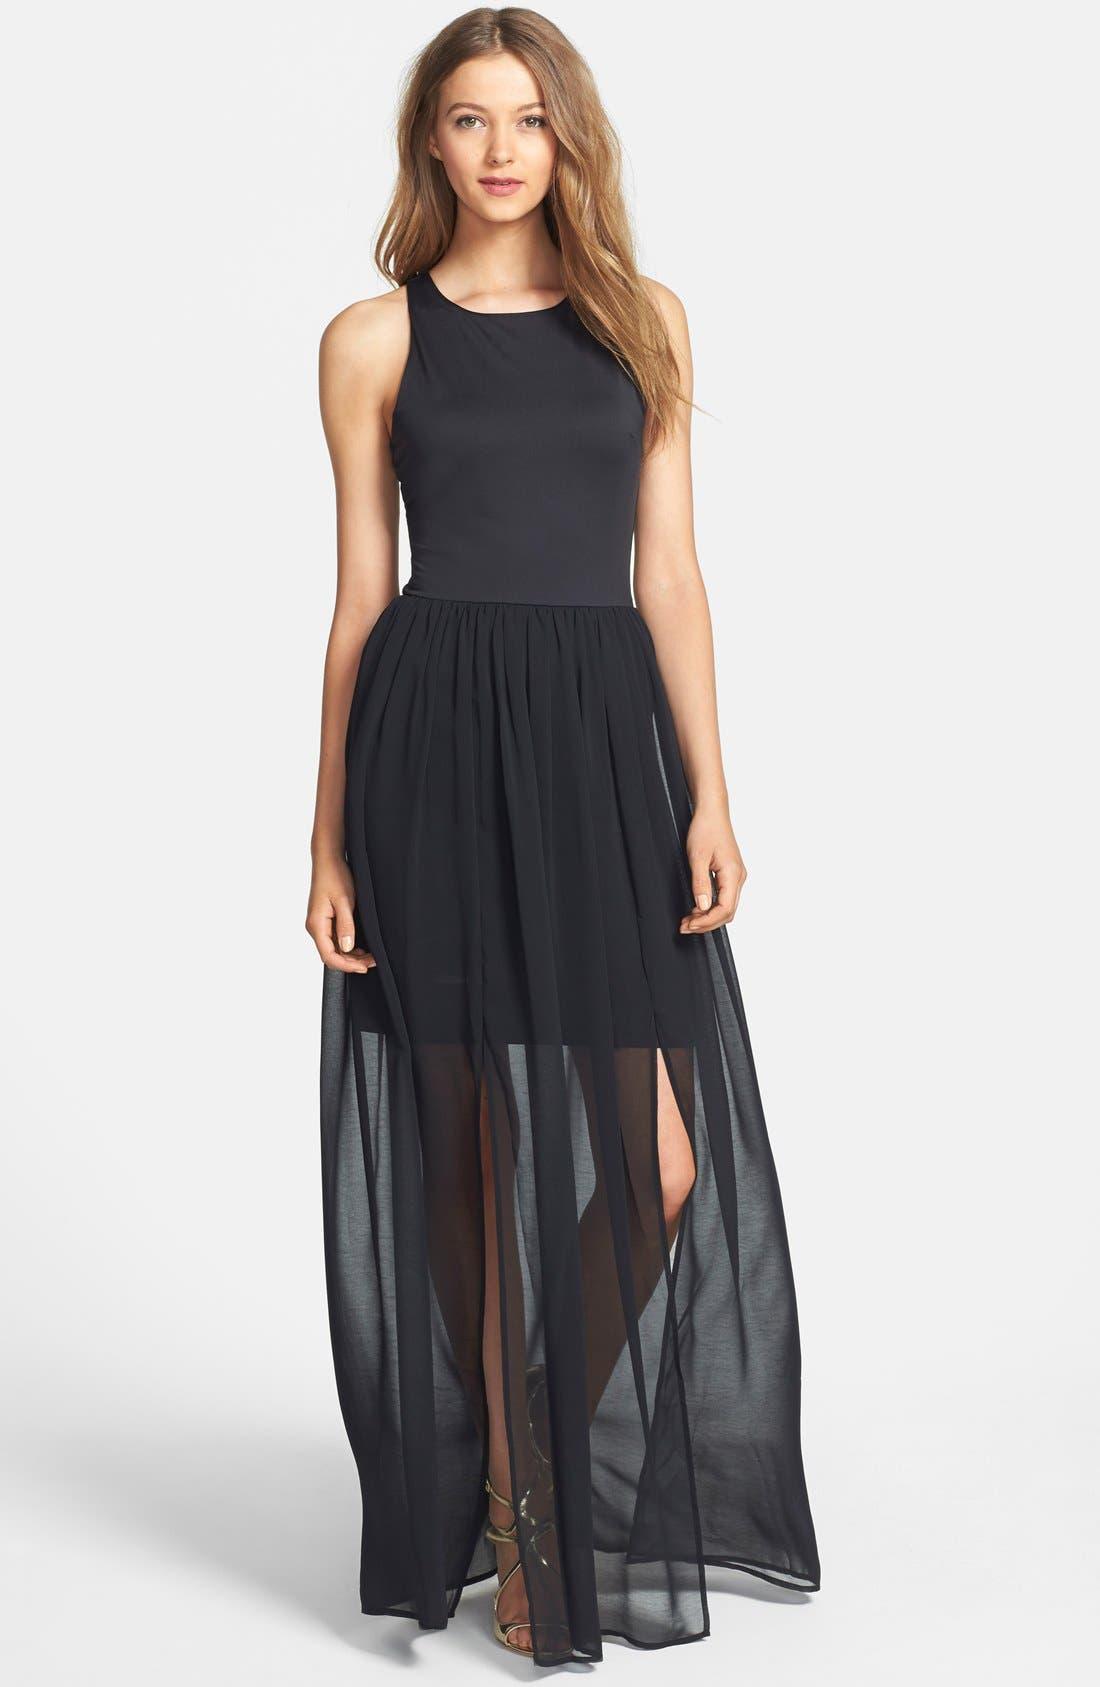 Main Image - Felicity & Coco Chiffon Overlay Sleeveless Jersey Dress (Nordstrom Exclusive)